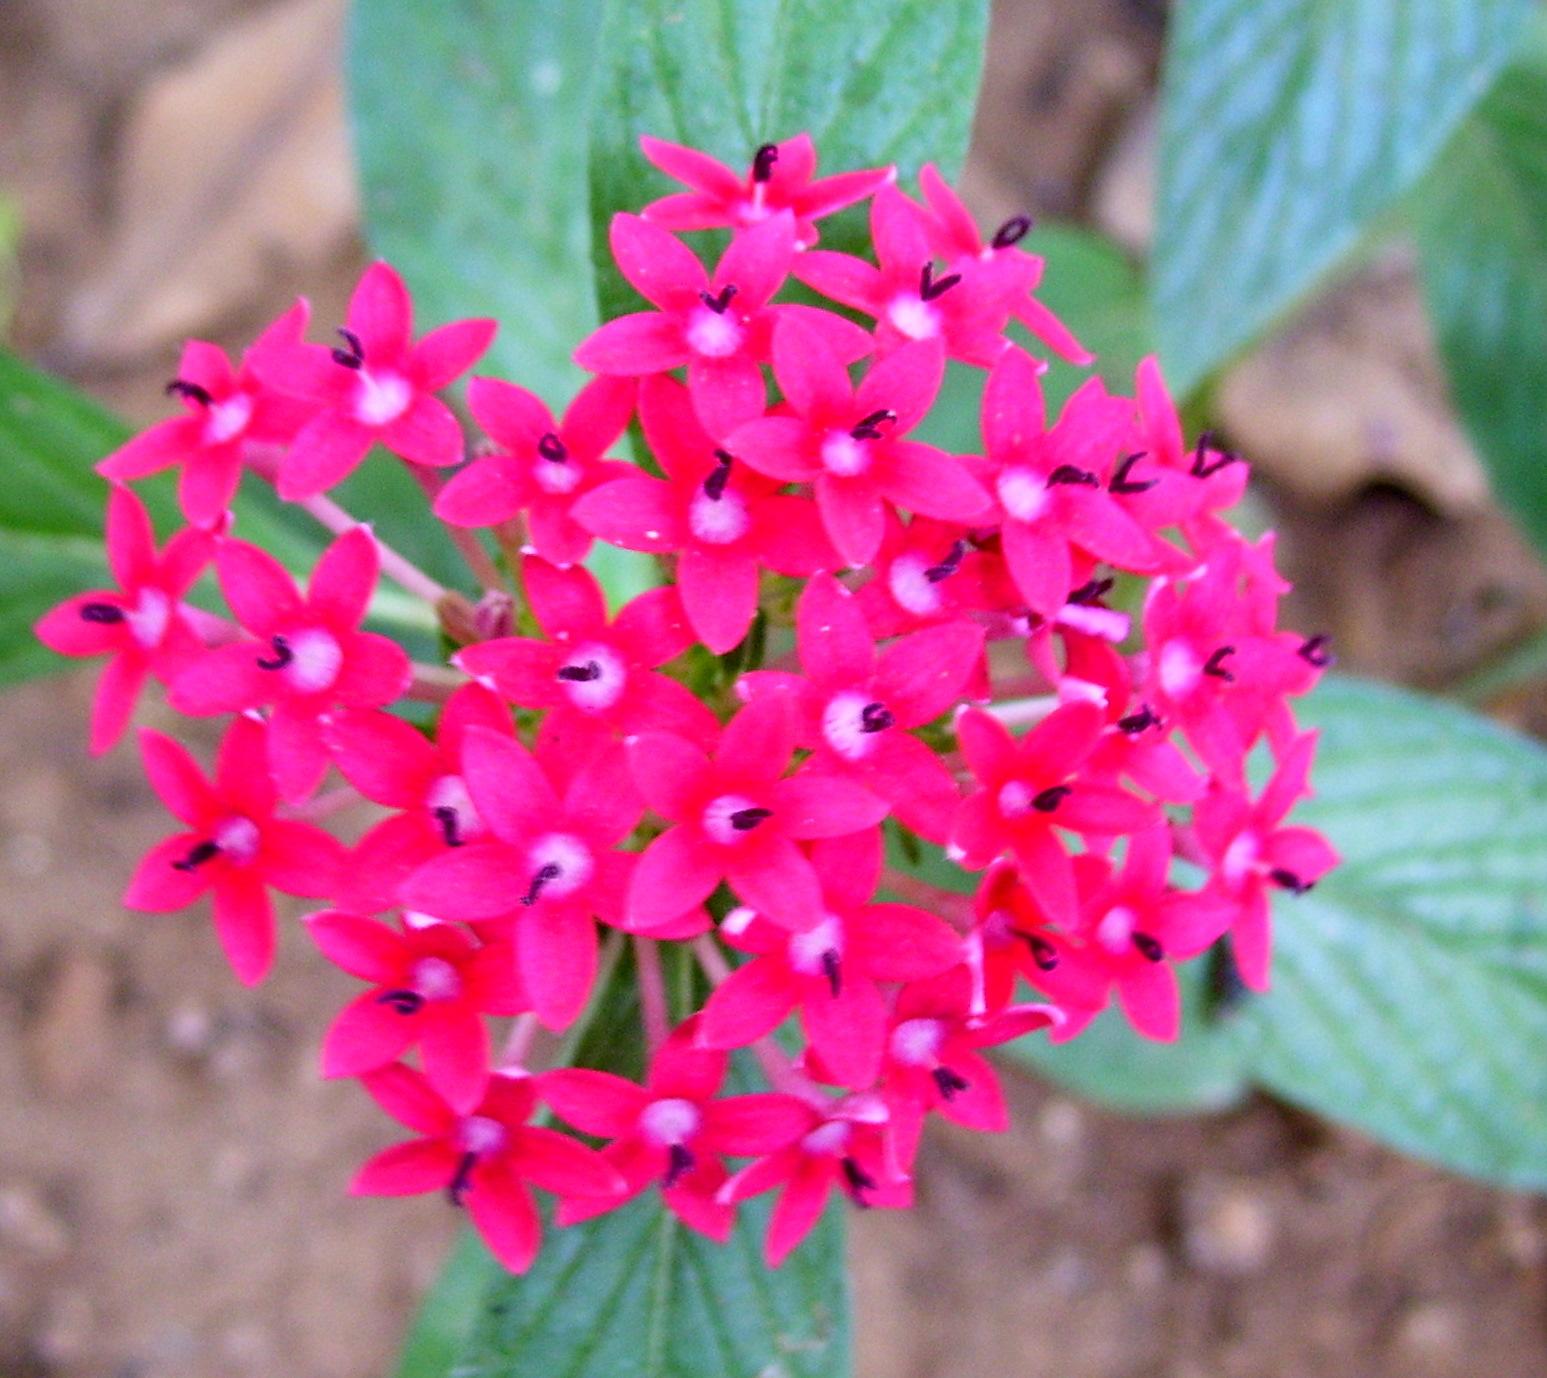 Daisy Flower Name In Tamil Flowers Online 2018 Flowers Online